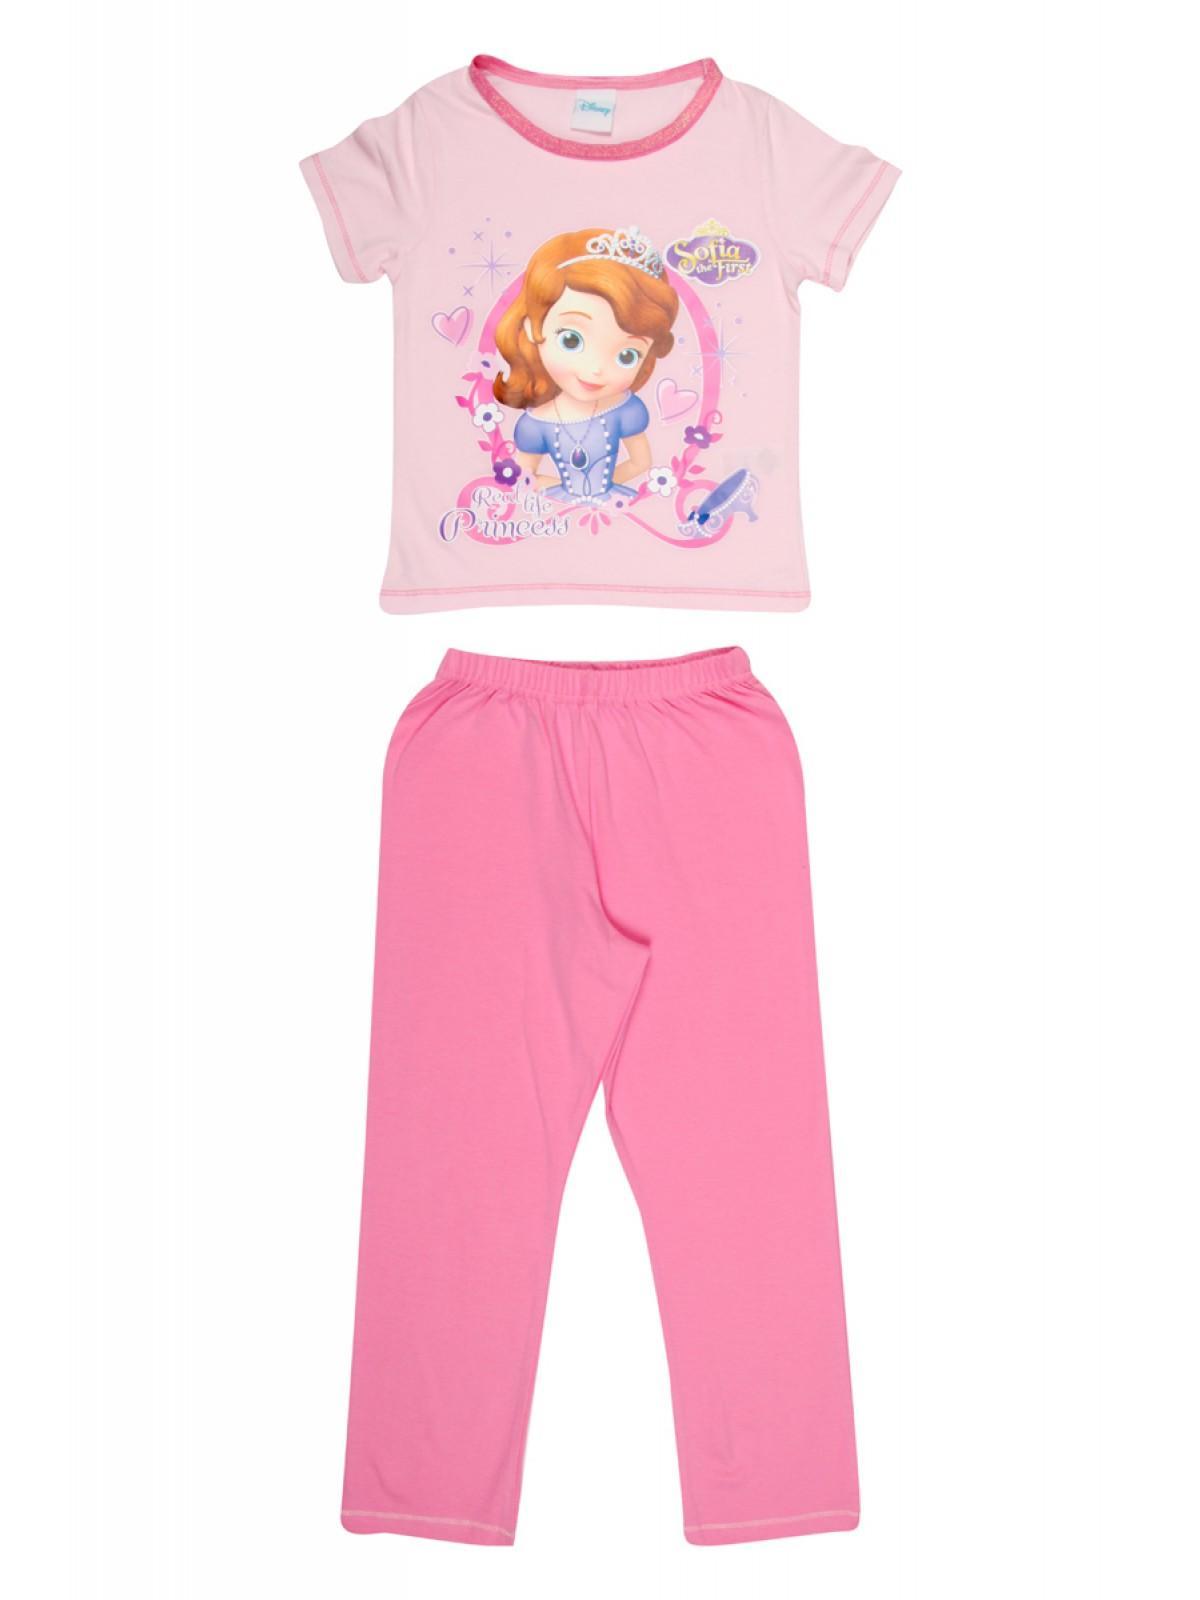 e035585773 Girls Younger Girls Disney Sofia The First Pyjama Set